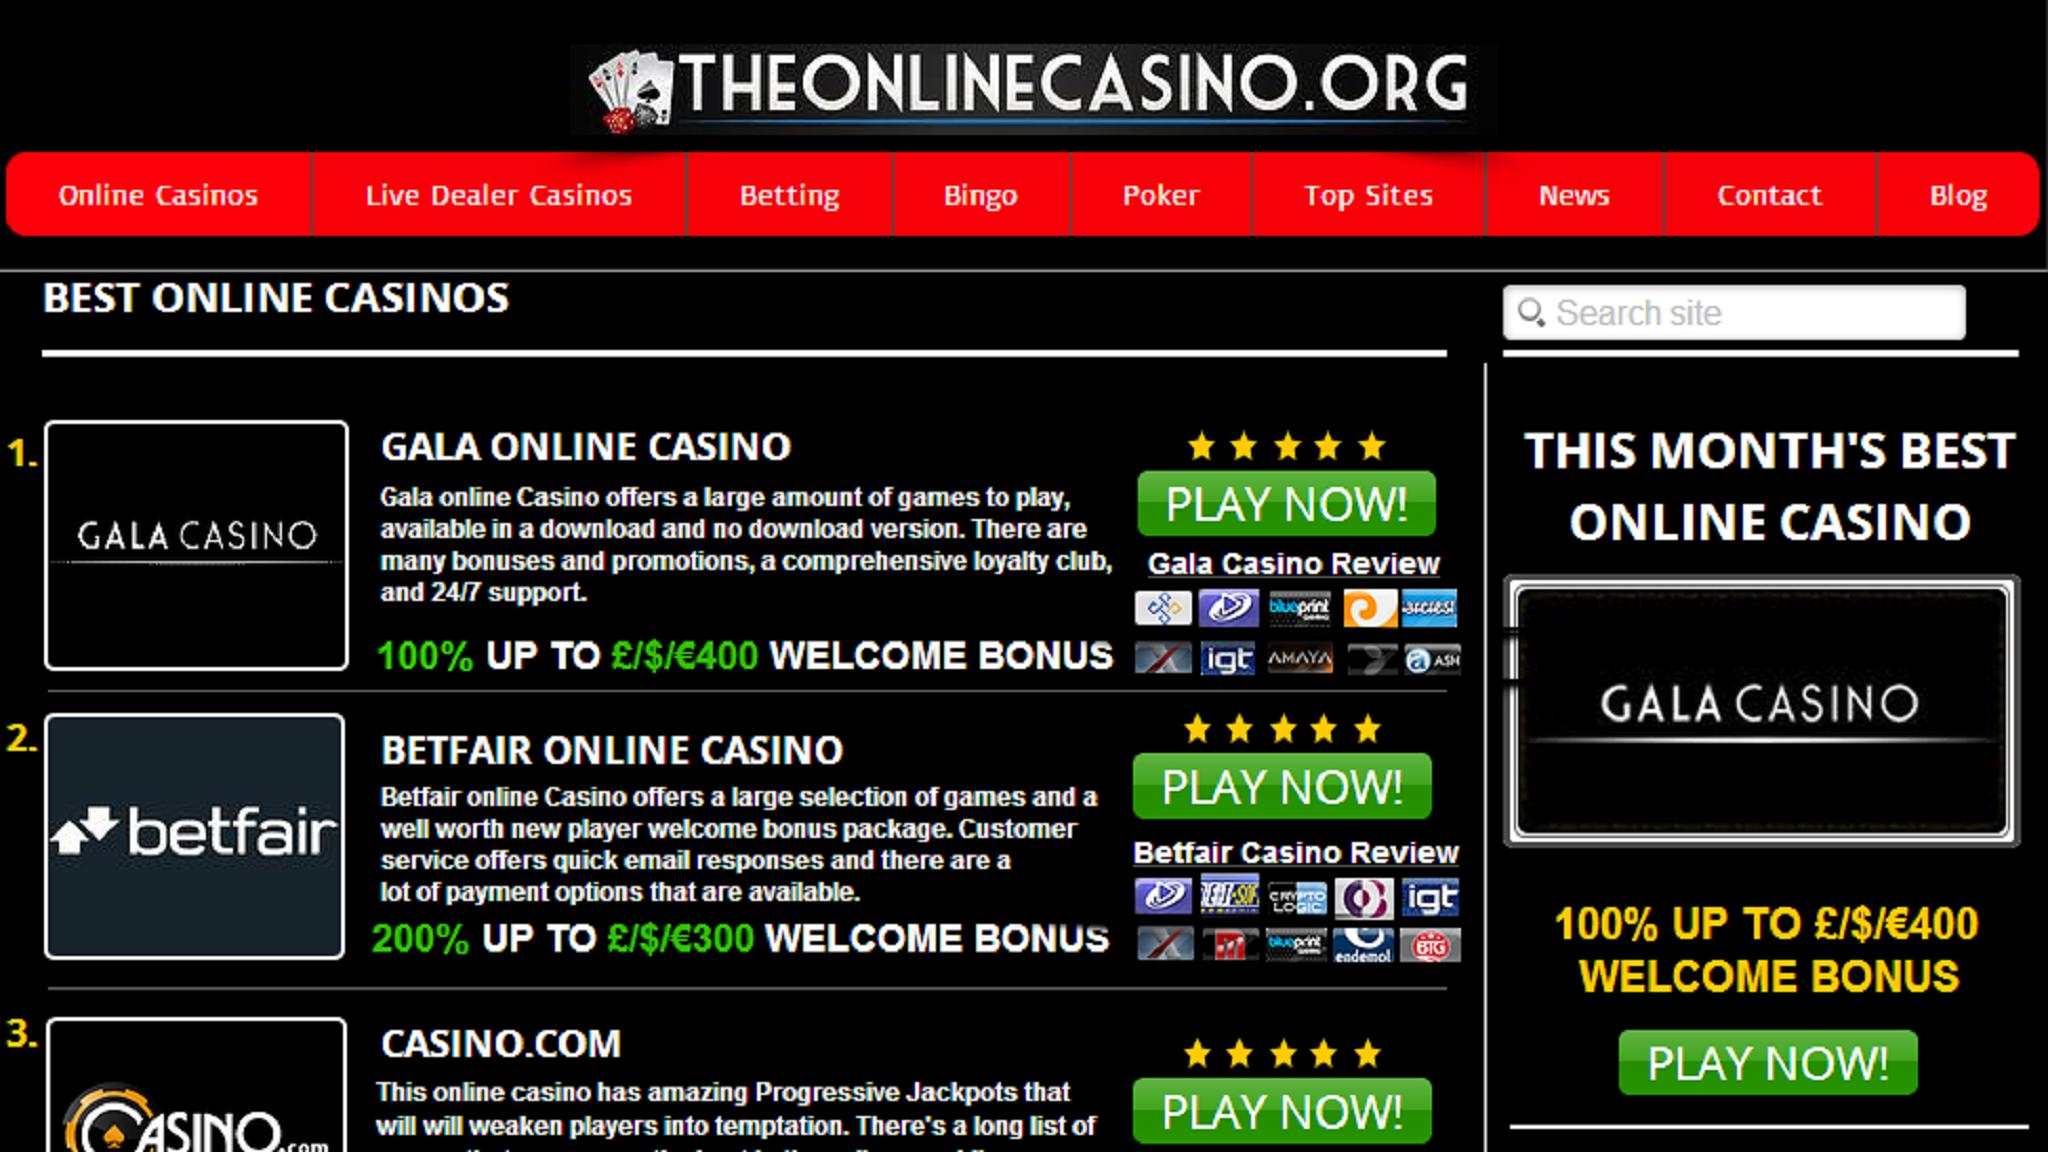 топ 10 онлайн казино